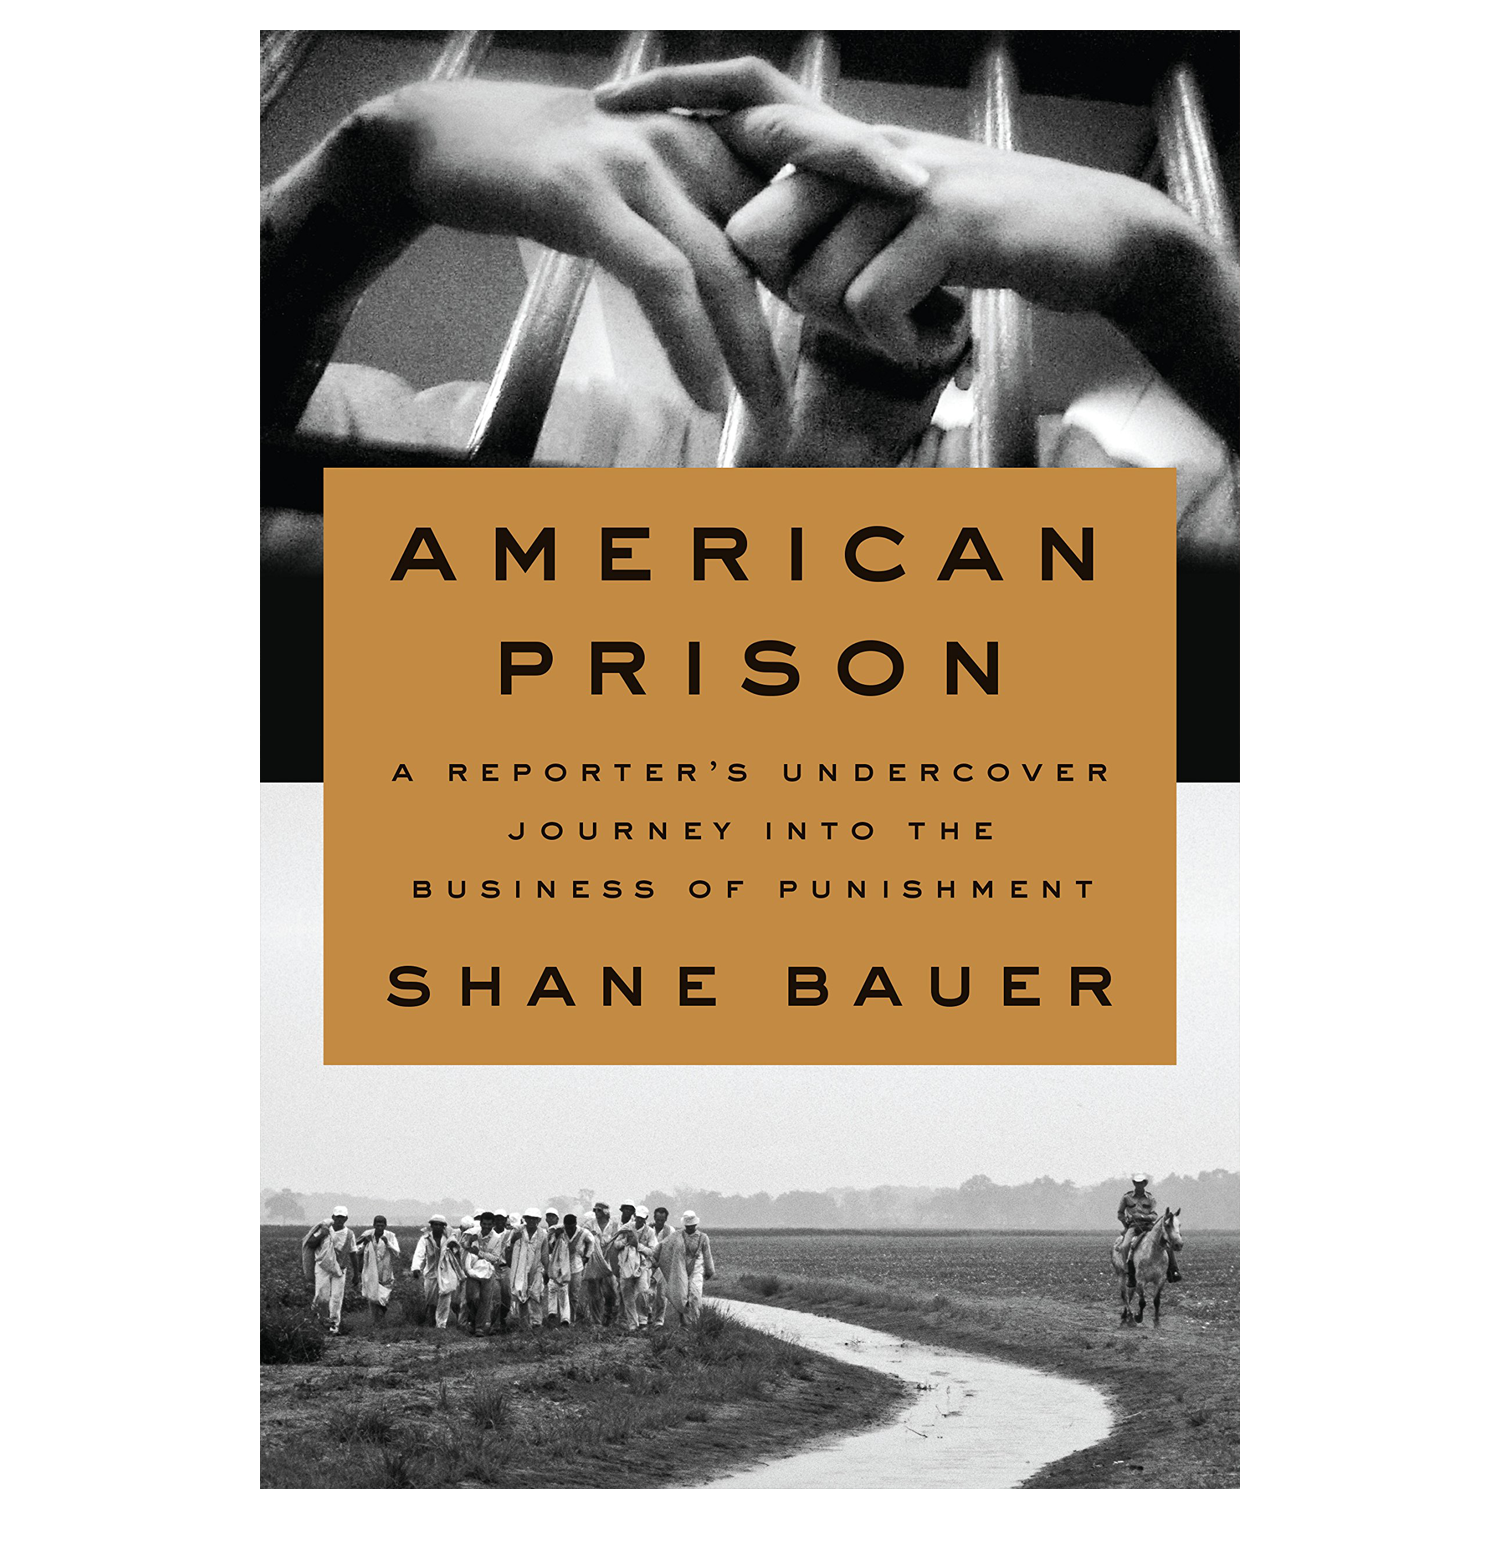 AMERICAN PRISON website.png